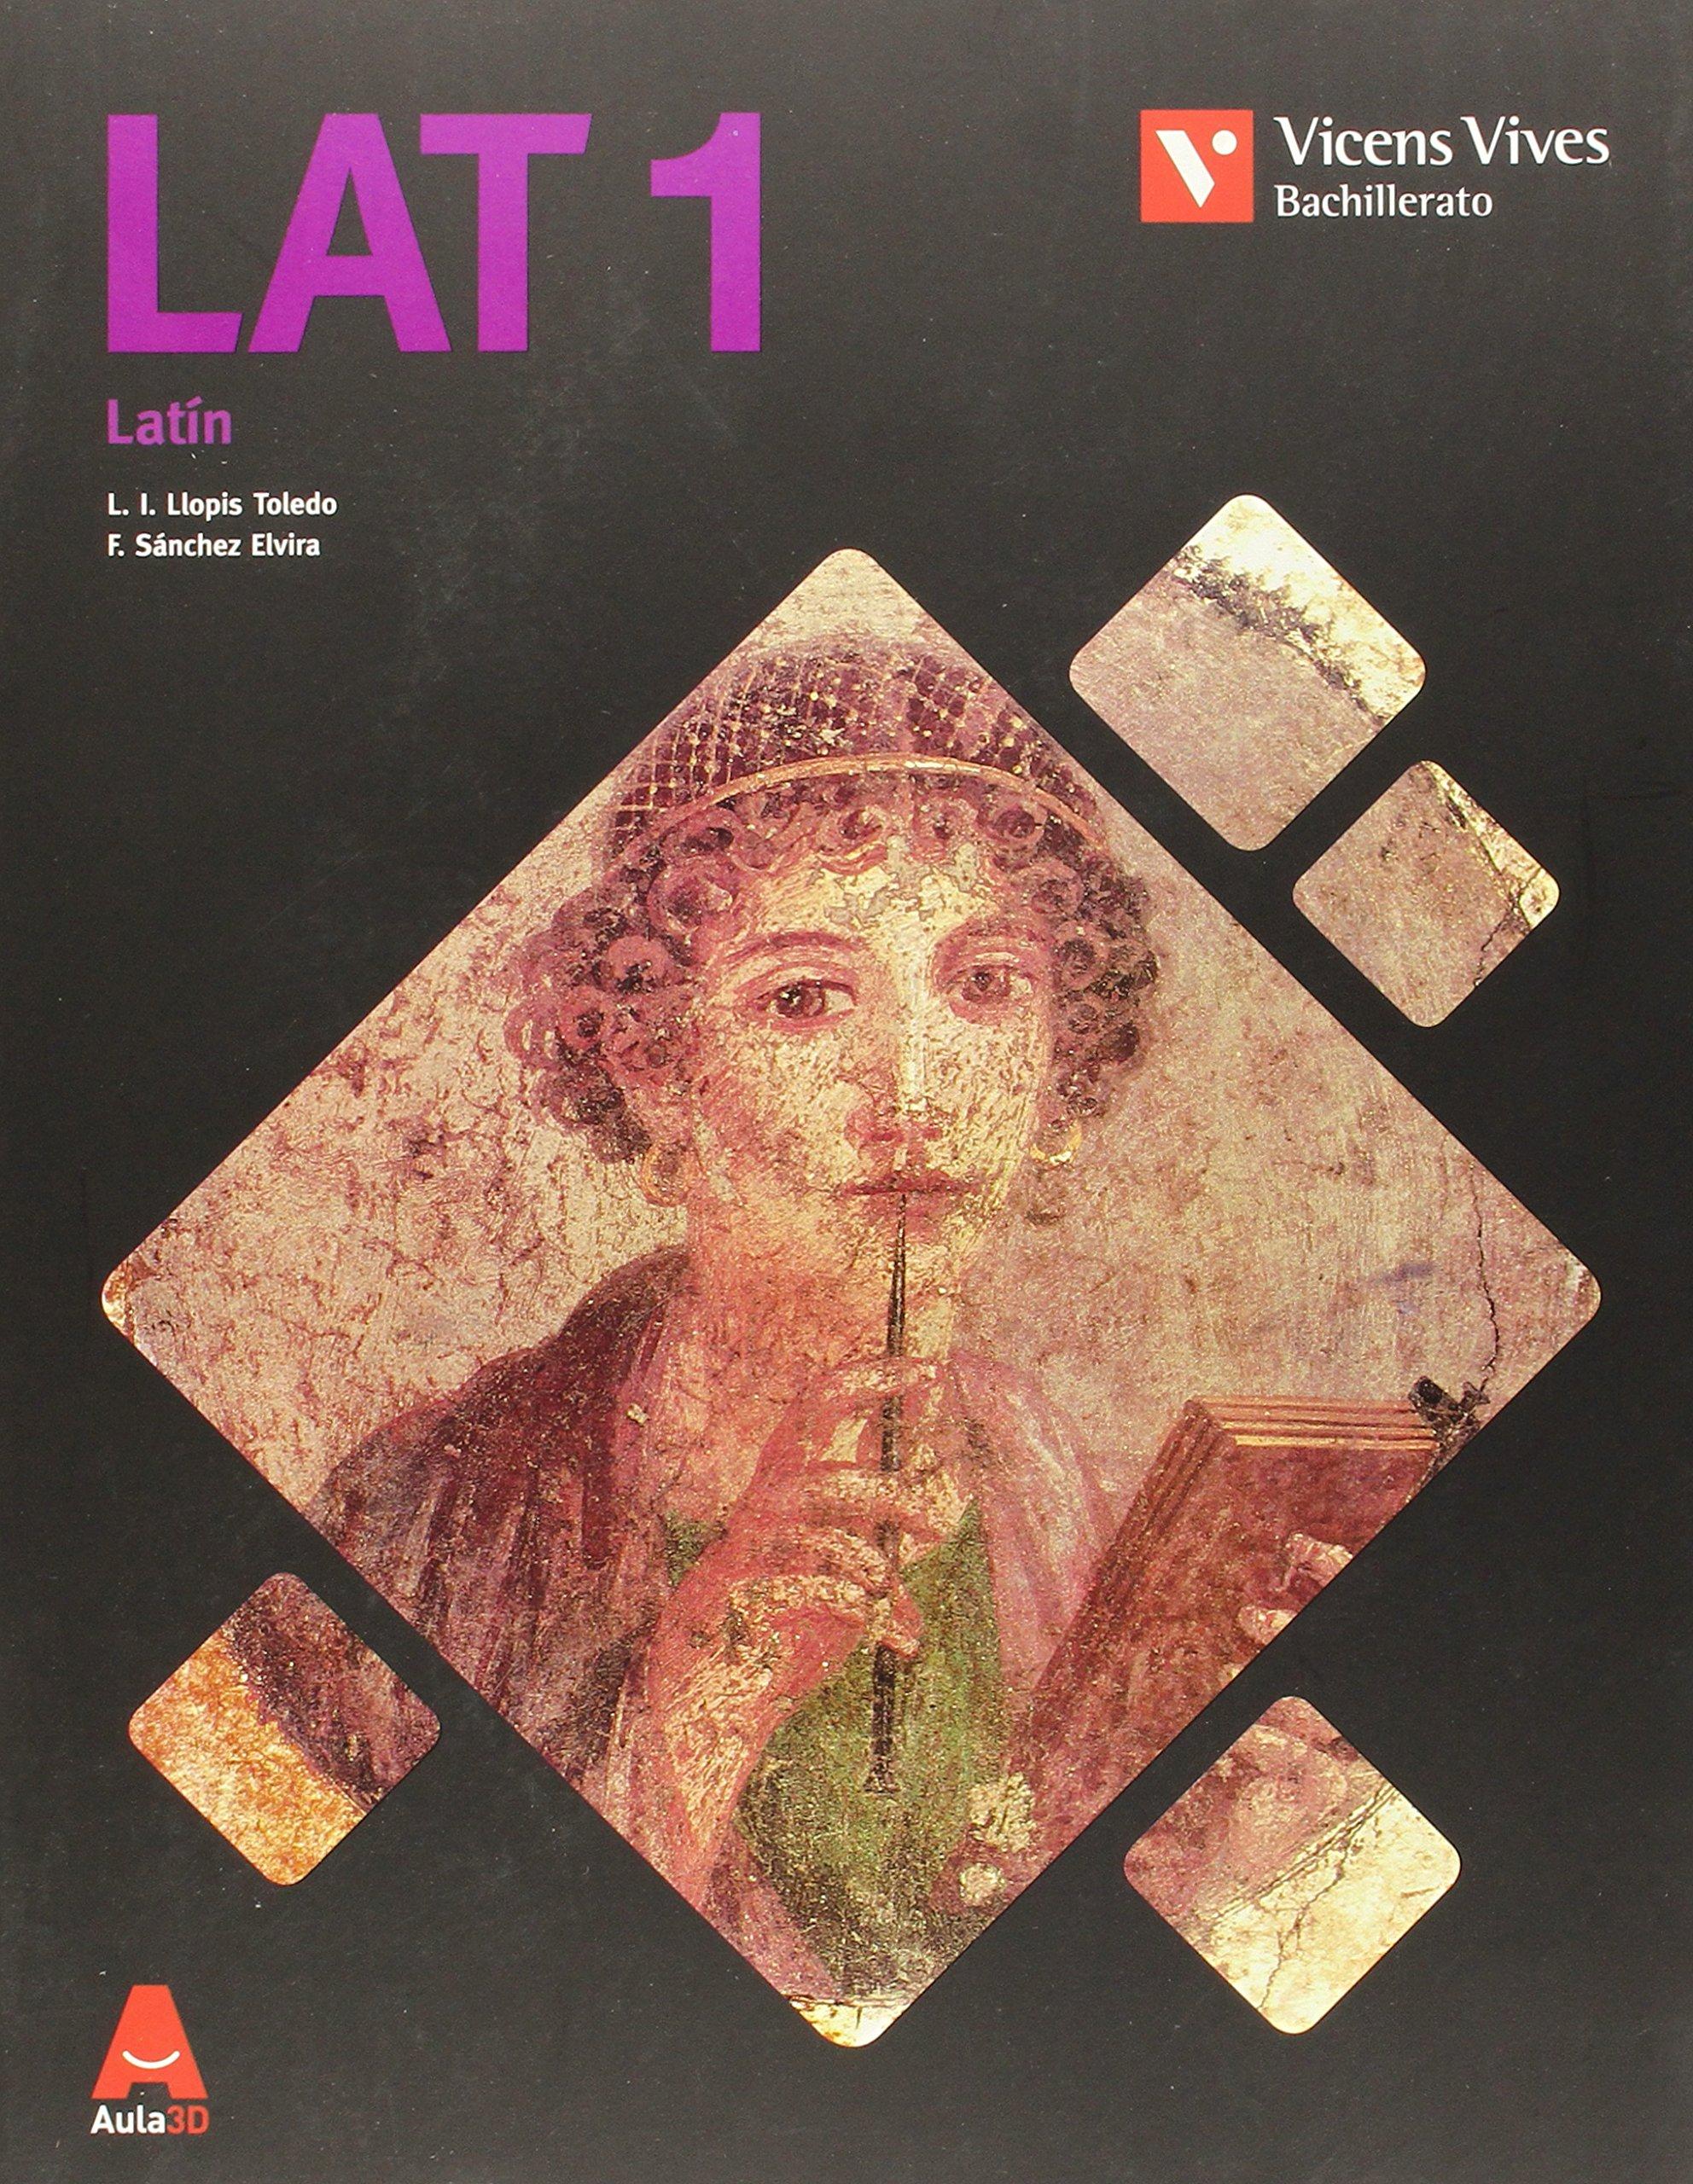 LAT 1 (Latin Bachillerato Aula 3d) - 9788468214559: Amazon.es: Llopis Toledo, Lucio Ignacio, Sanchez Elvira, Francisco: Libros